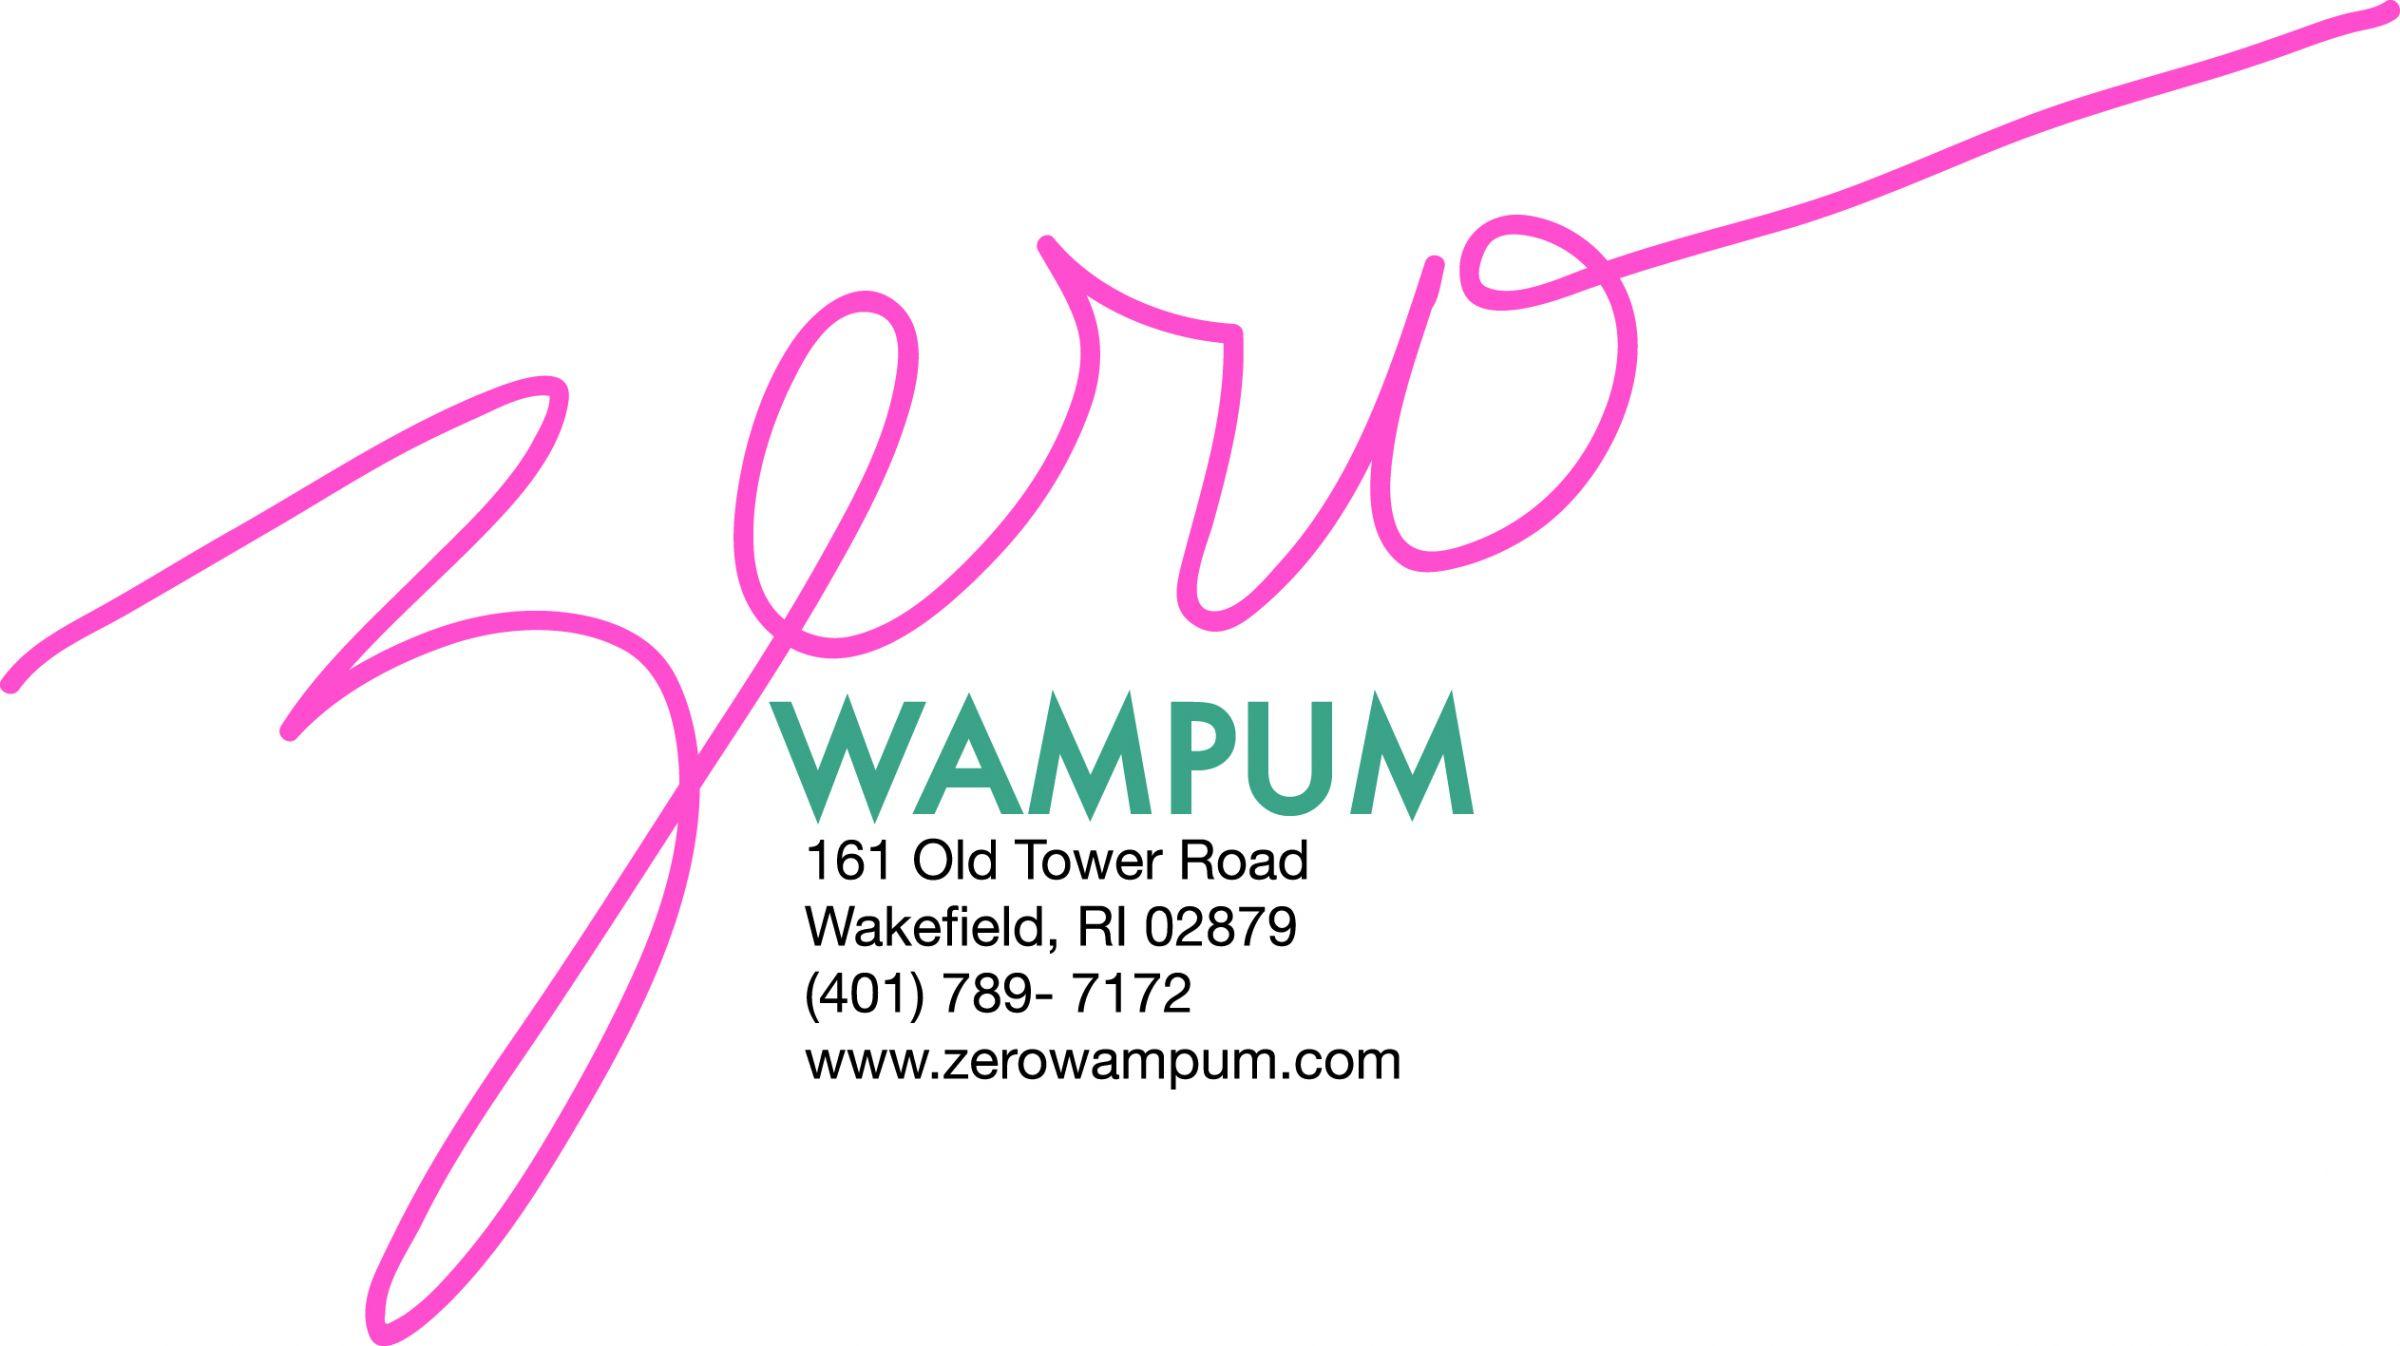 Zero Wampum